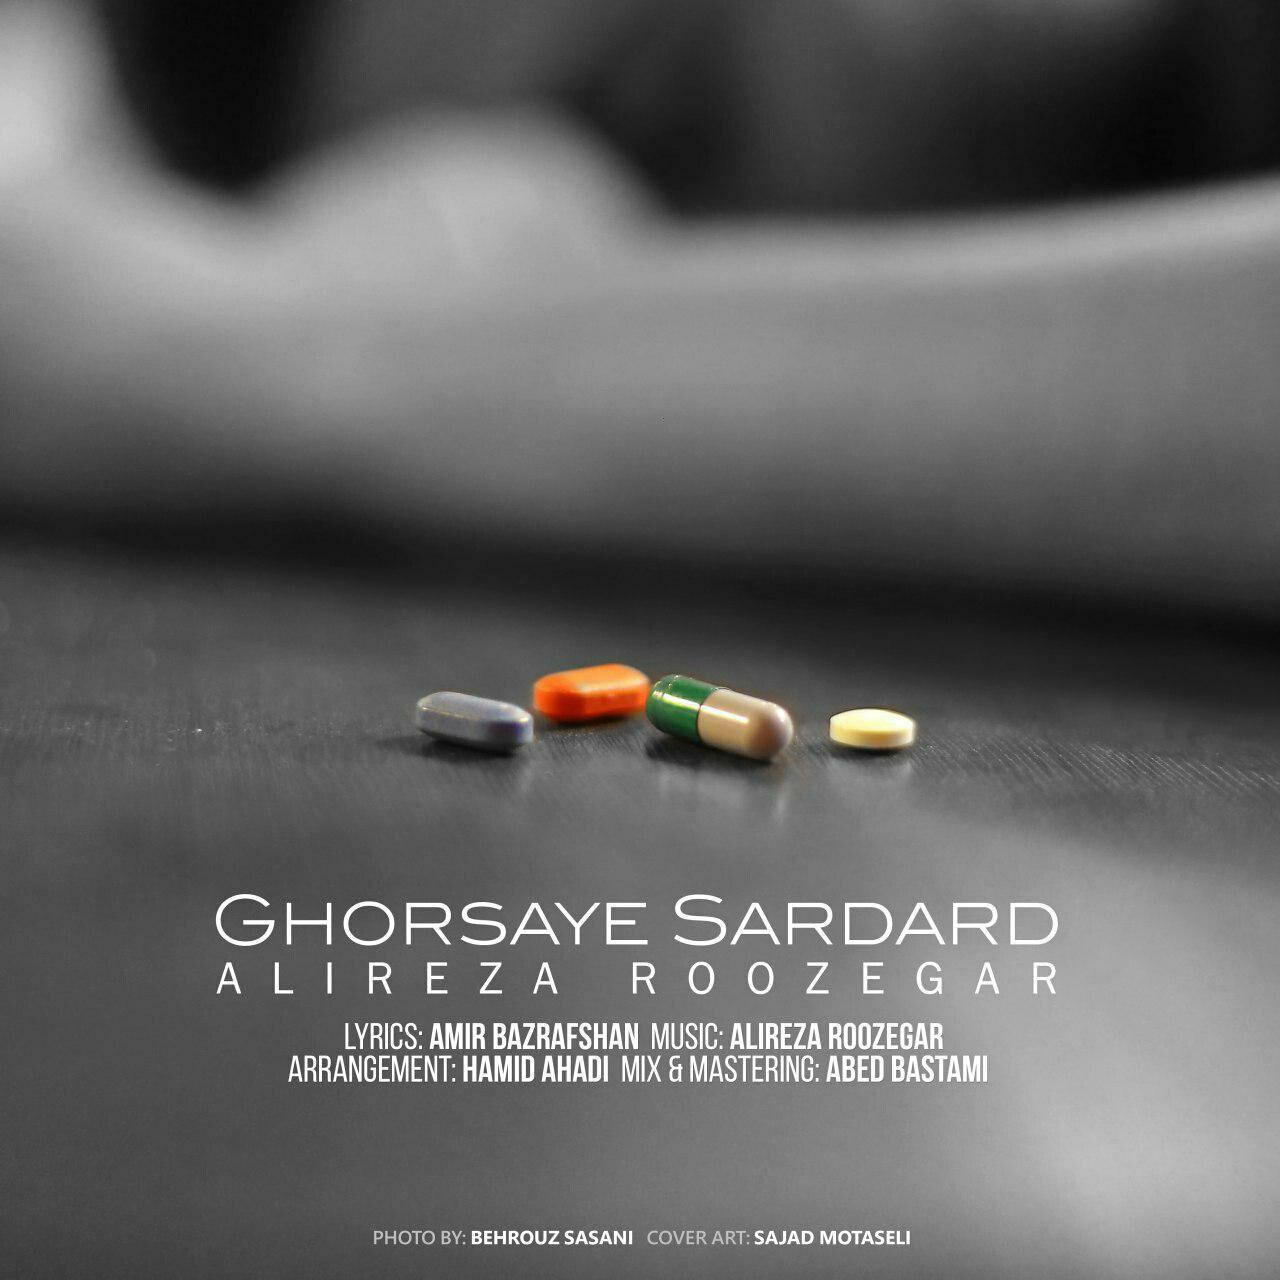 Alireza Roozegar Ghorsaye Sardard - دانلود آهنگ جدید علیرضا روزگار به نام قرصای سردرد